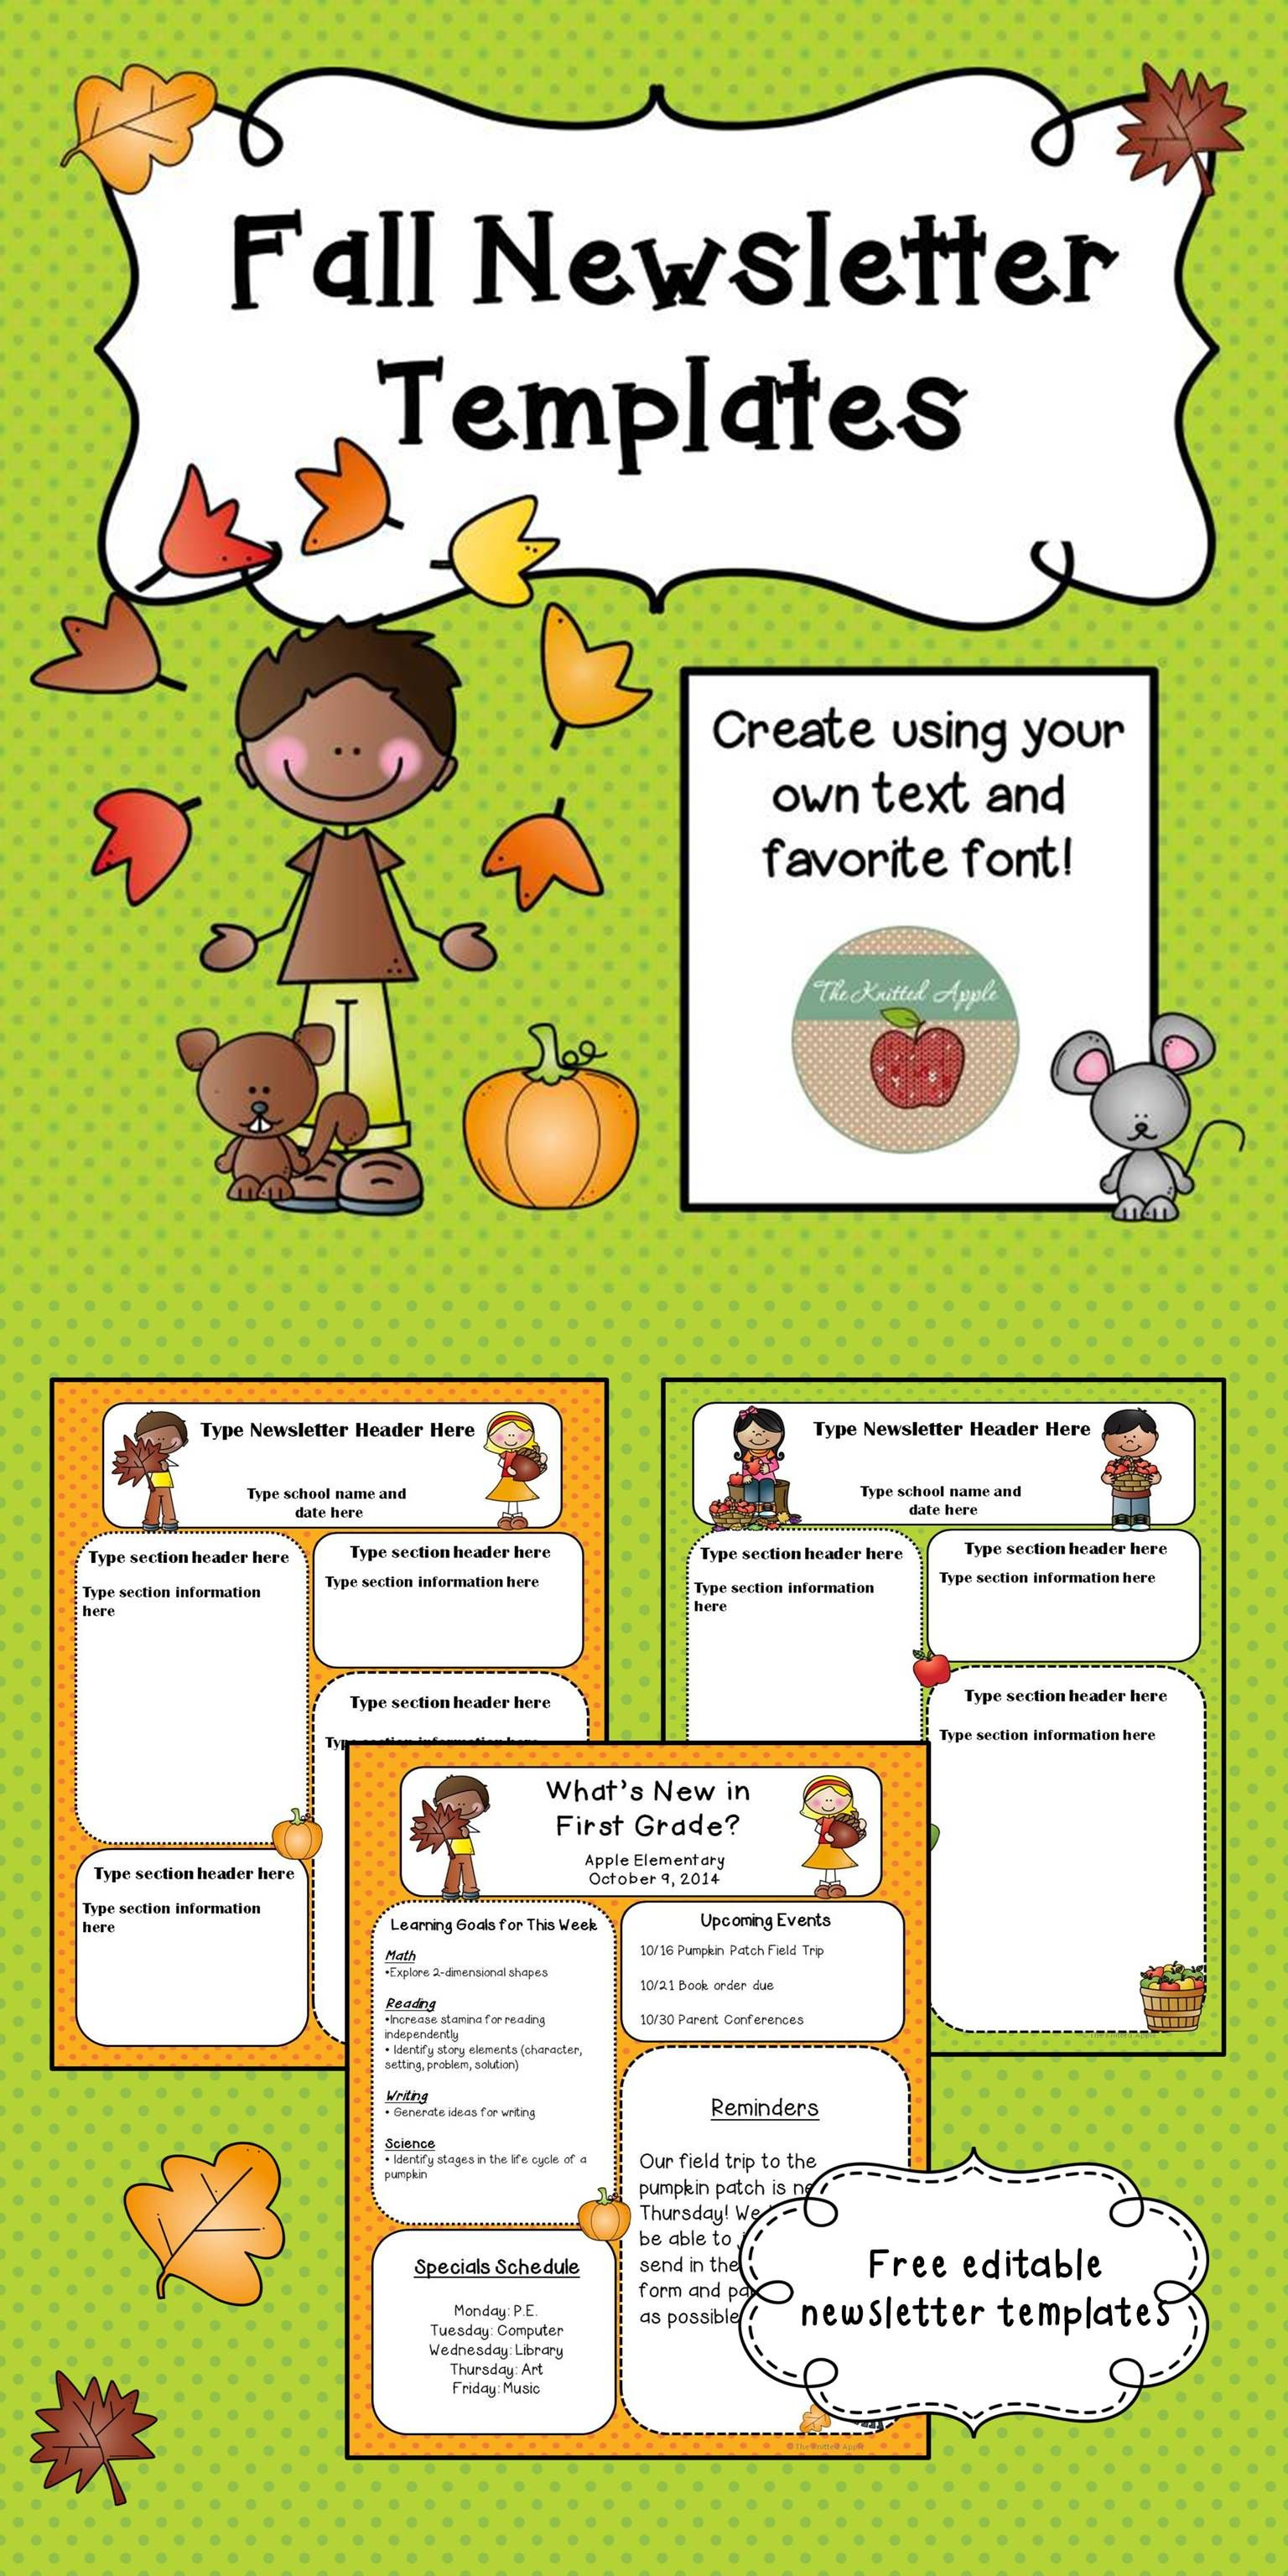 Fall Newsletter Templates Freebie